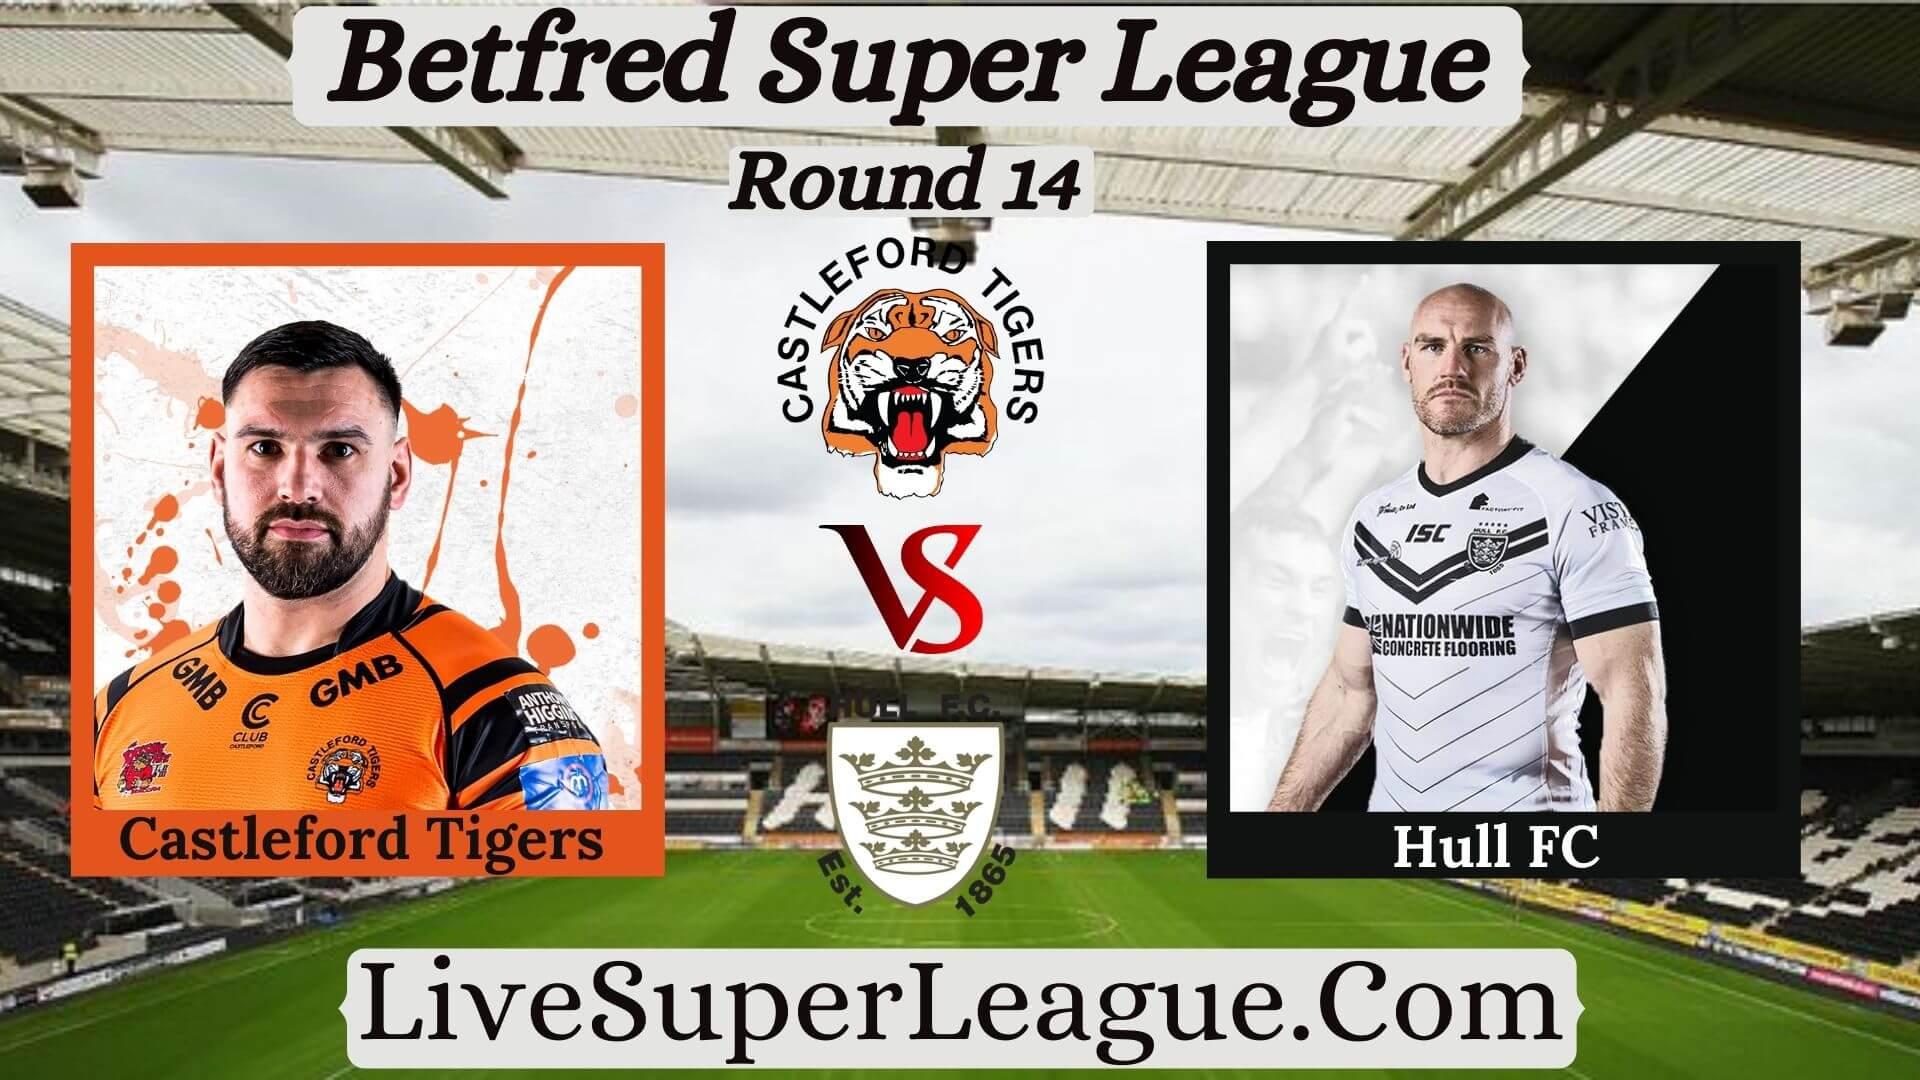 Castleford Tigers Vs Hull FC Rd 14 Live Stream 2020 | Full Match Replay